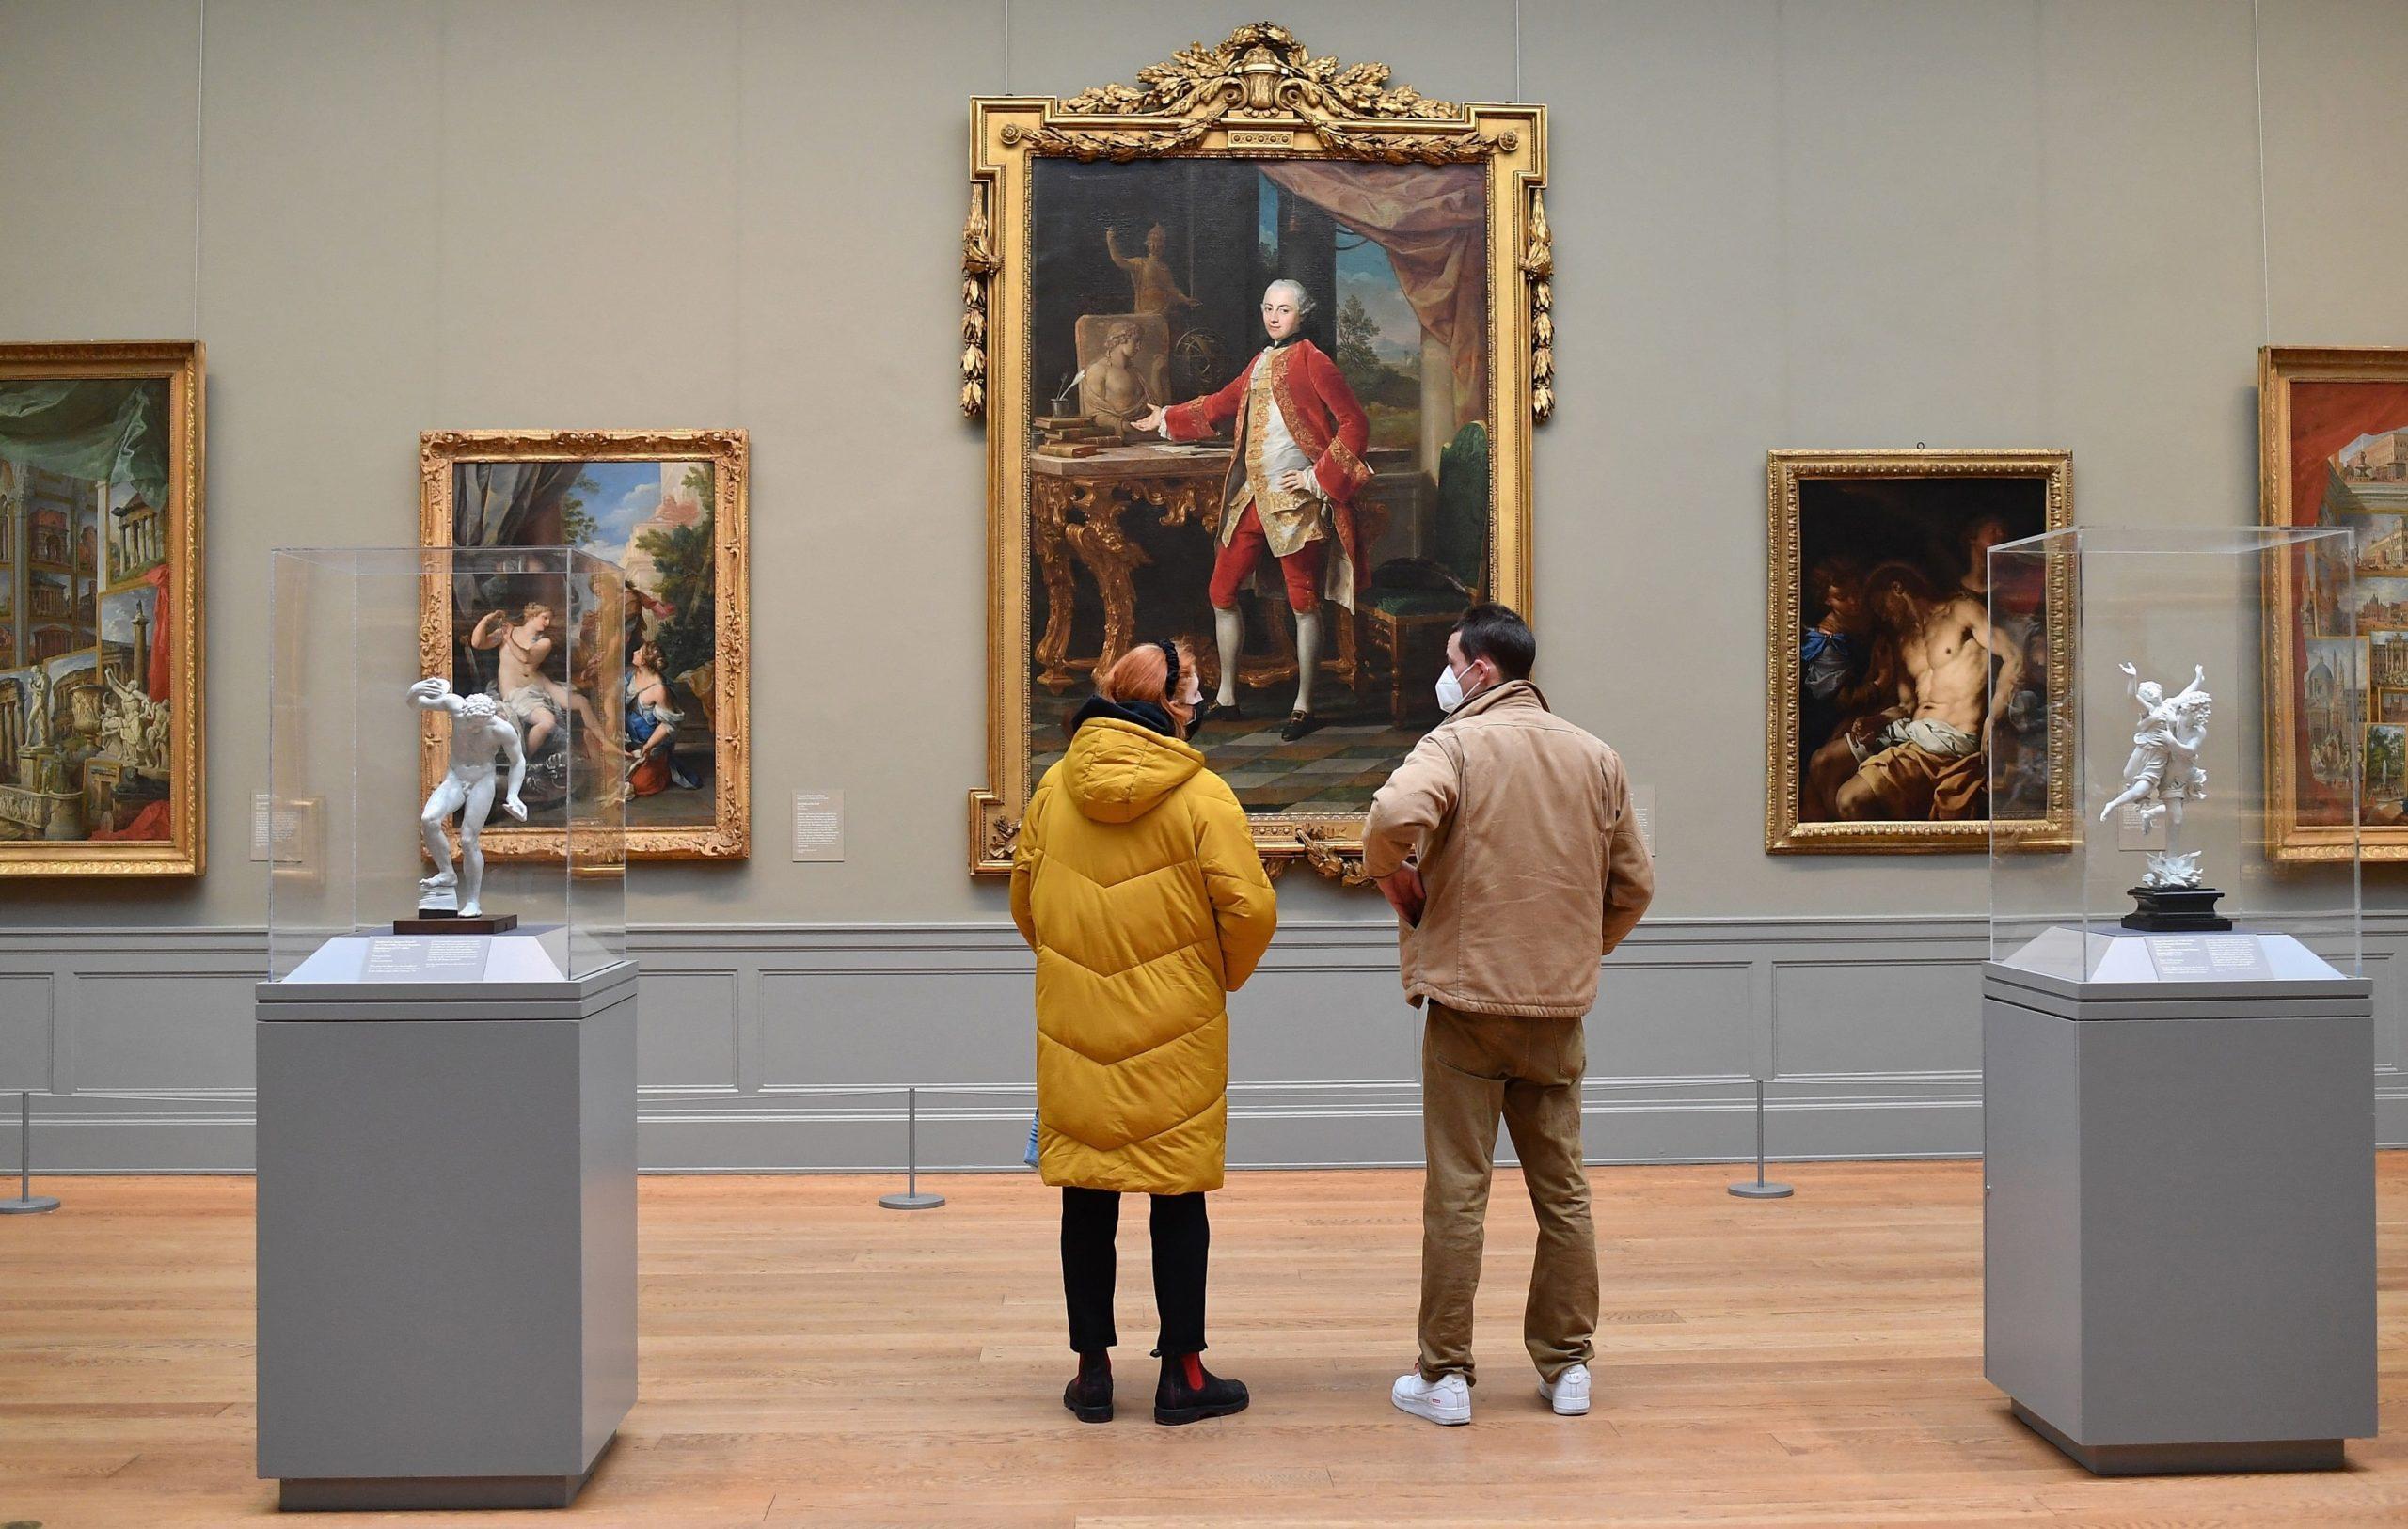 Should Museums Sell Their Artworks? The Debate Intensifies